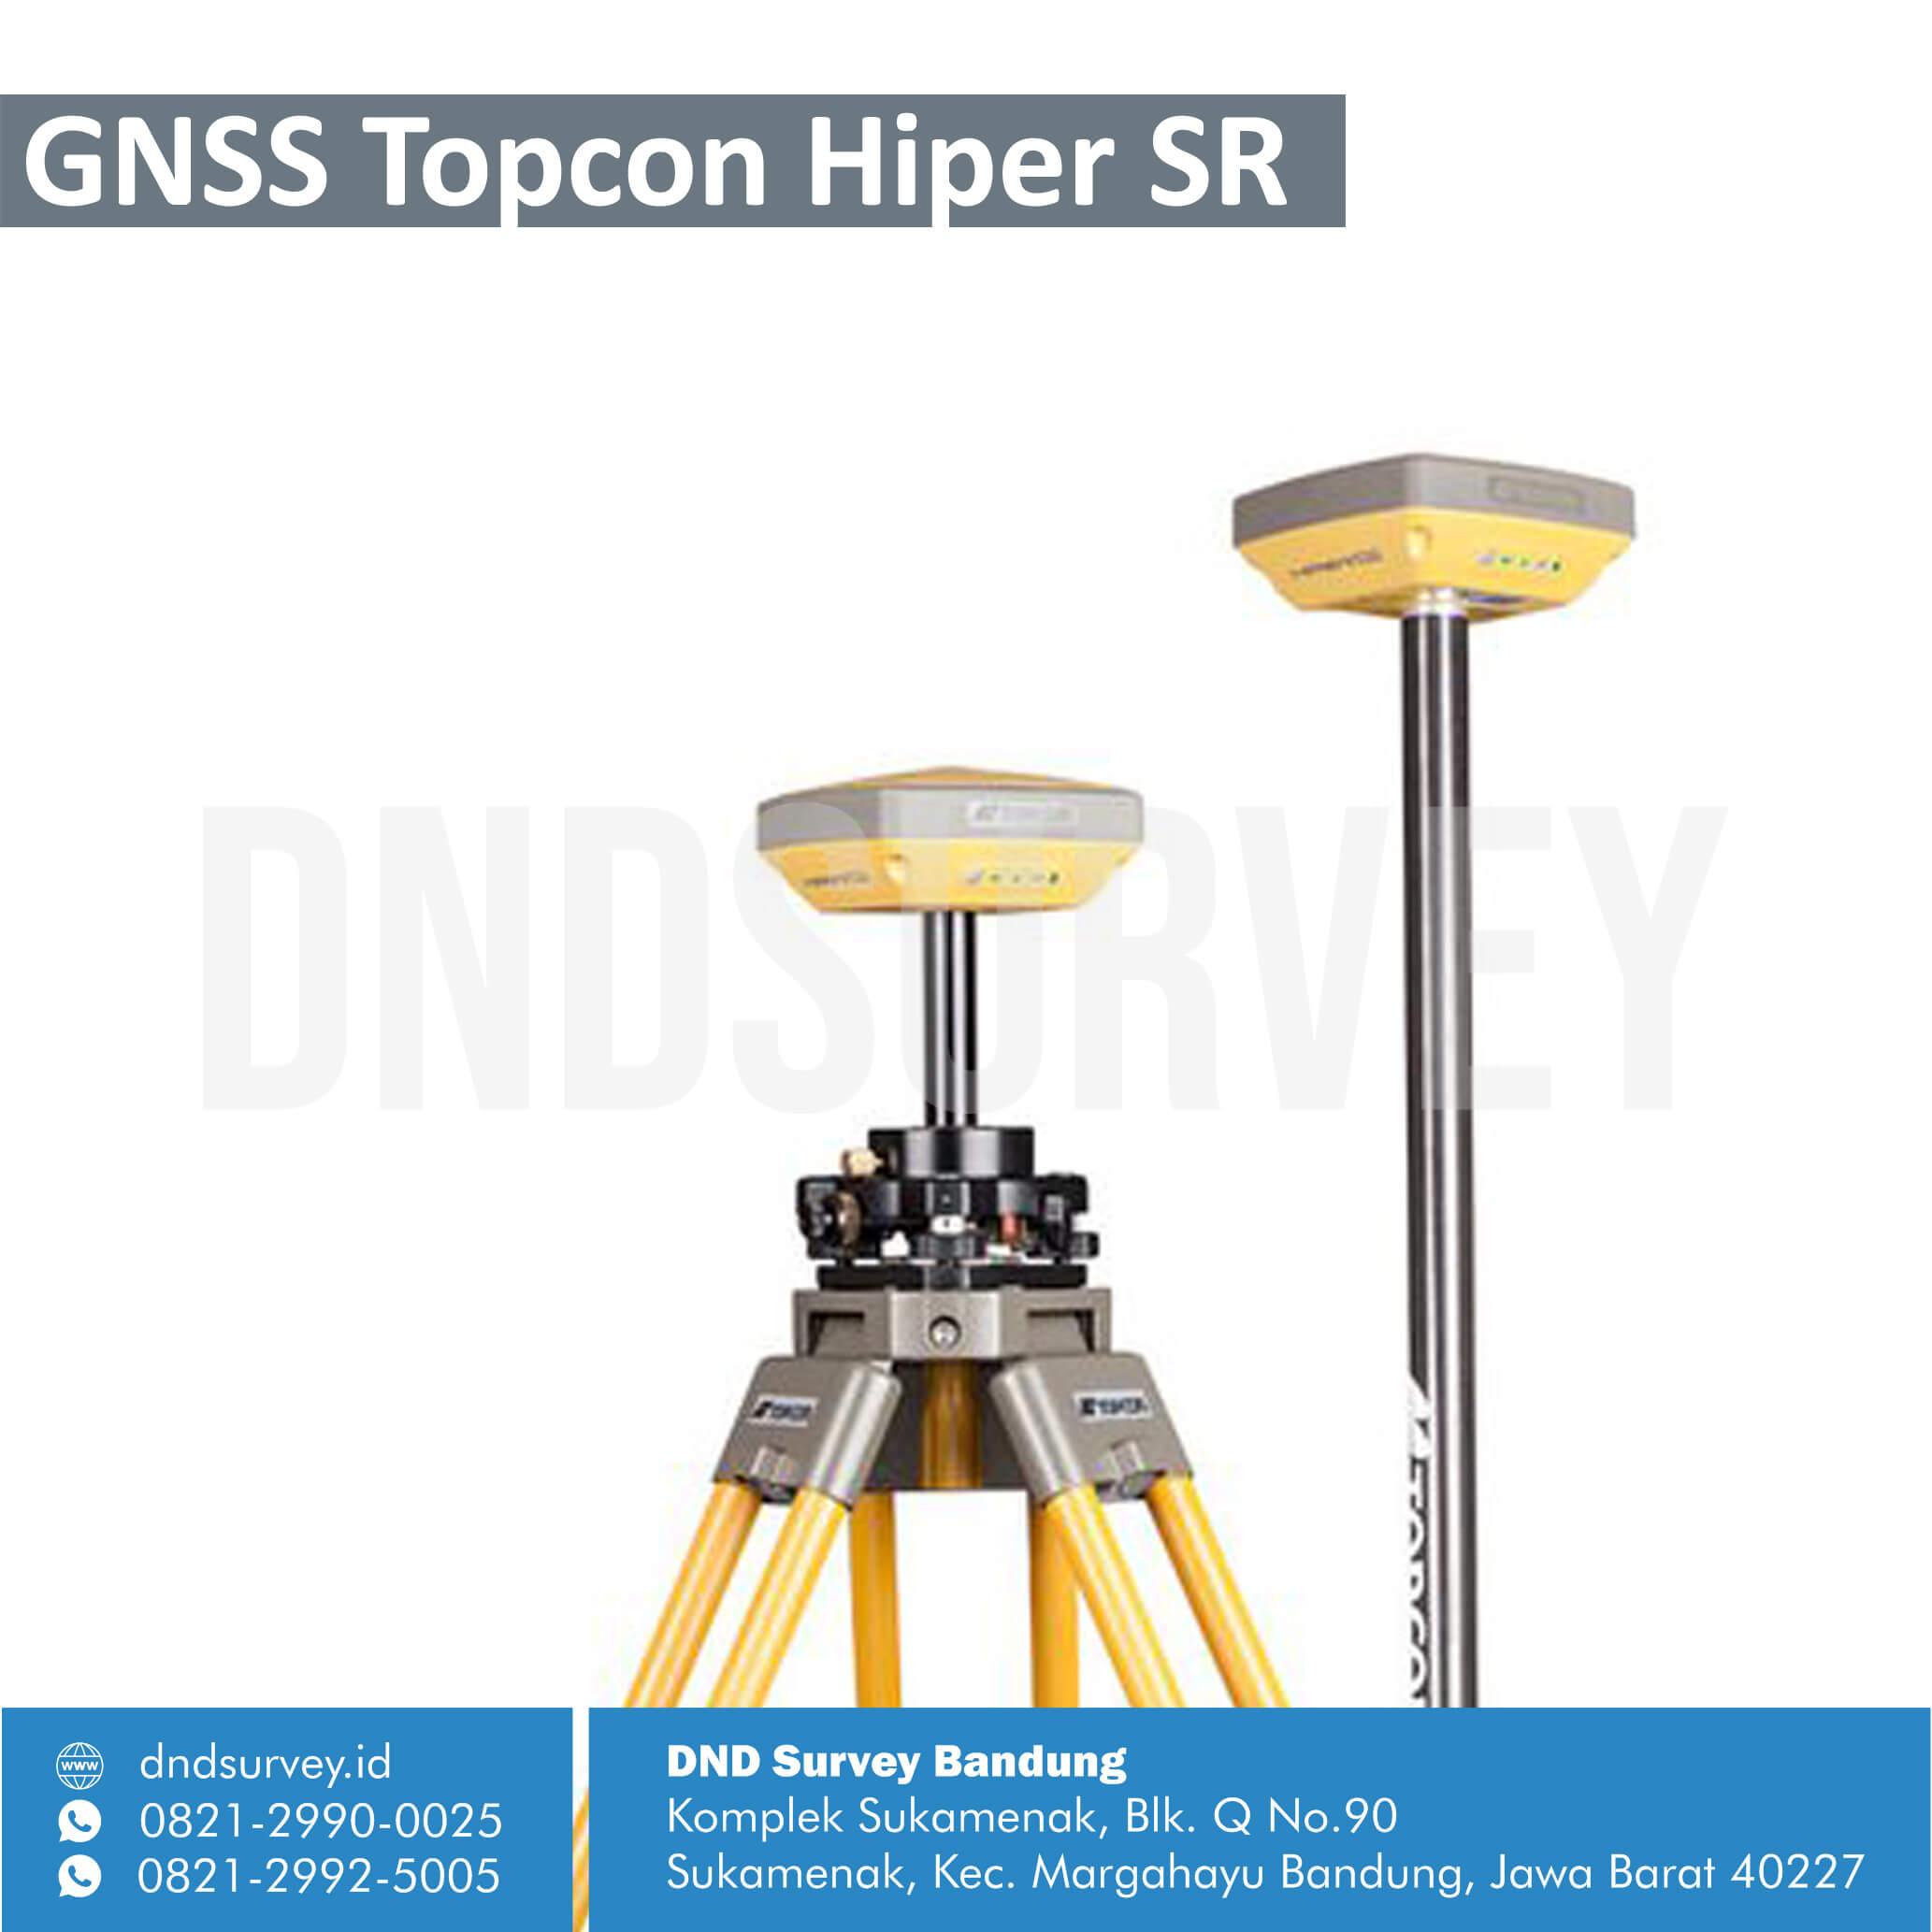 GNSS Topcon Hiper SR